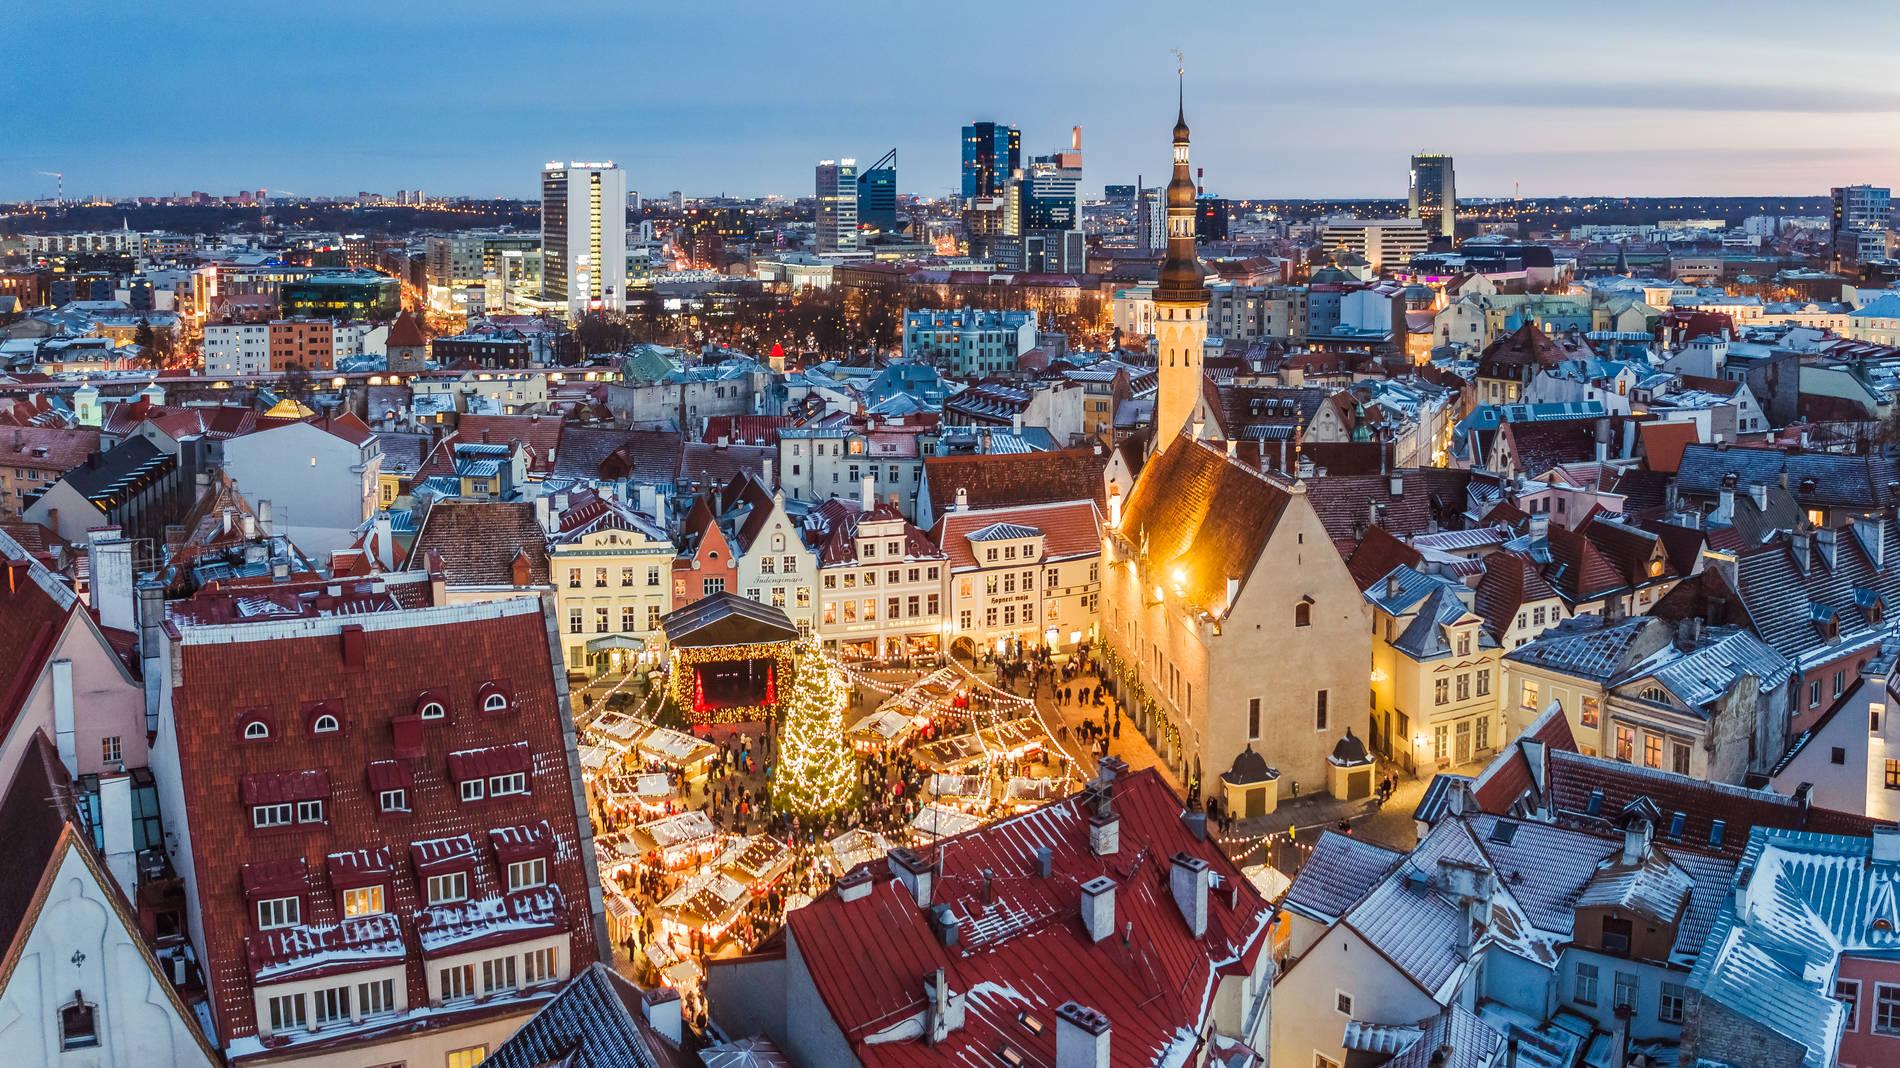 Christmas market in the Old Town of Tallinn, Estonia